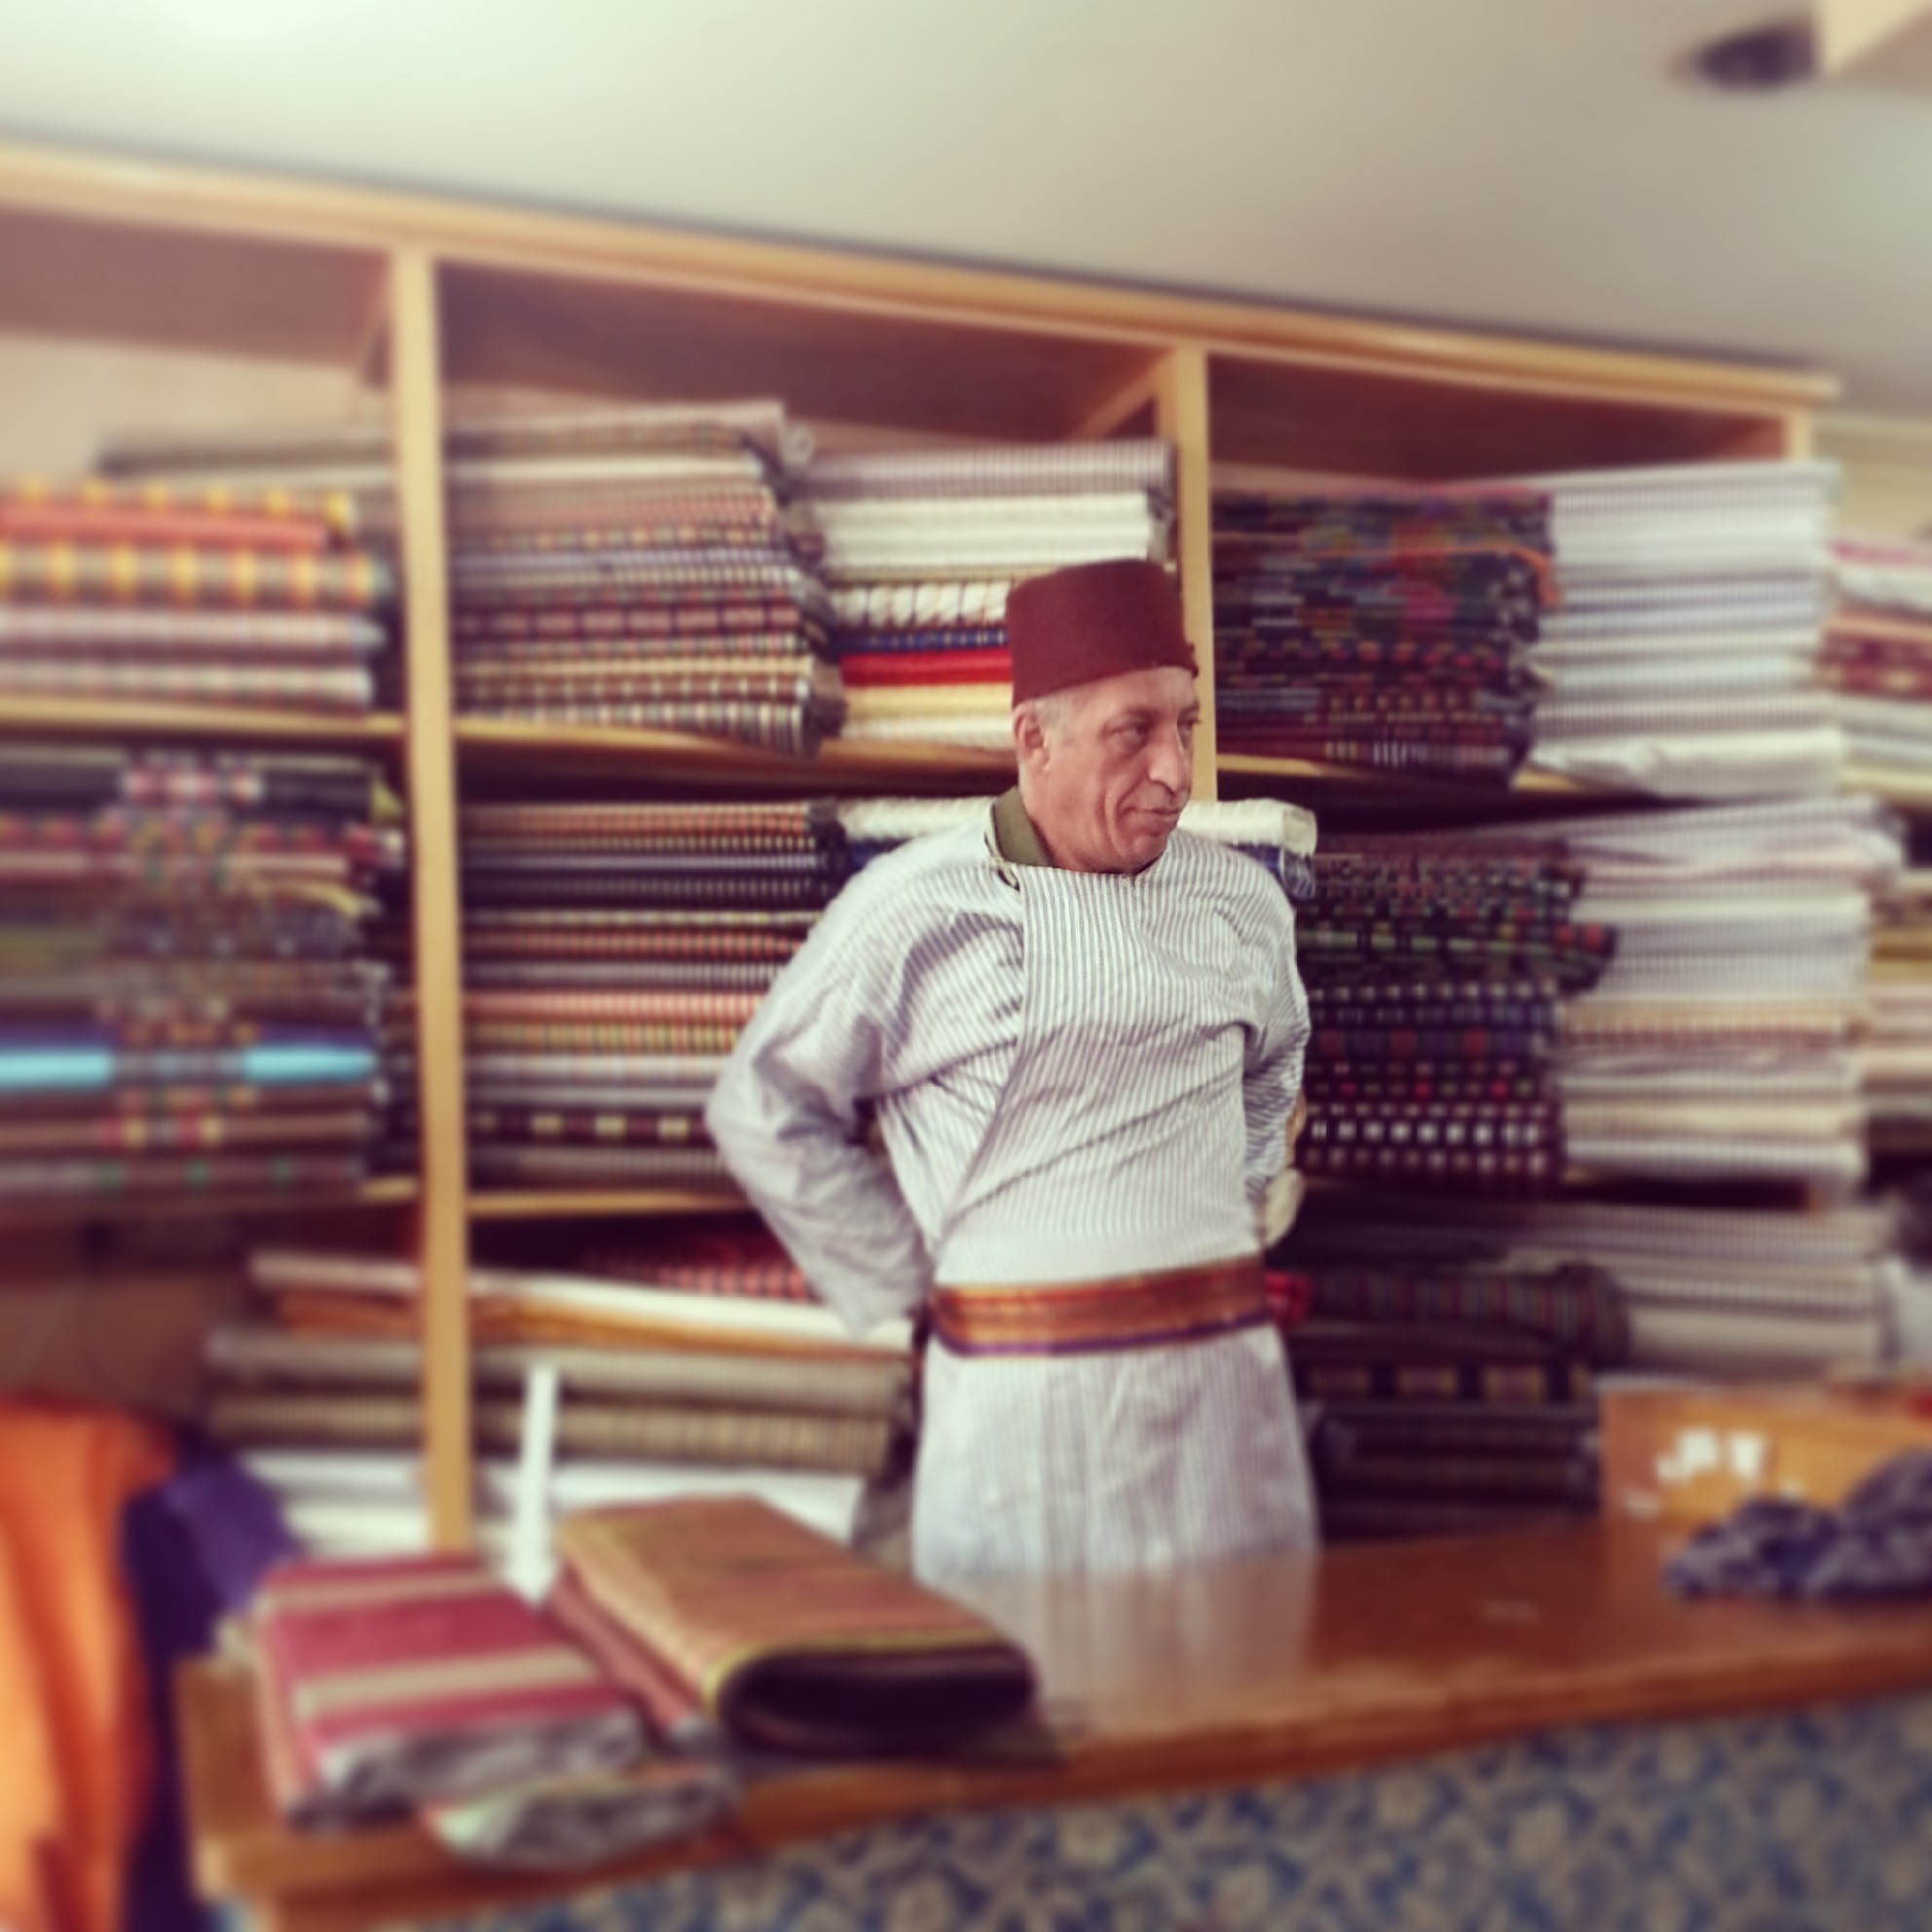 The inimitable Bilal Abu Khalaf dons his traditional garb